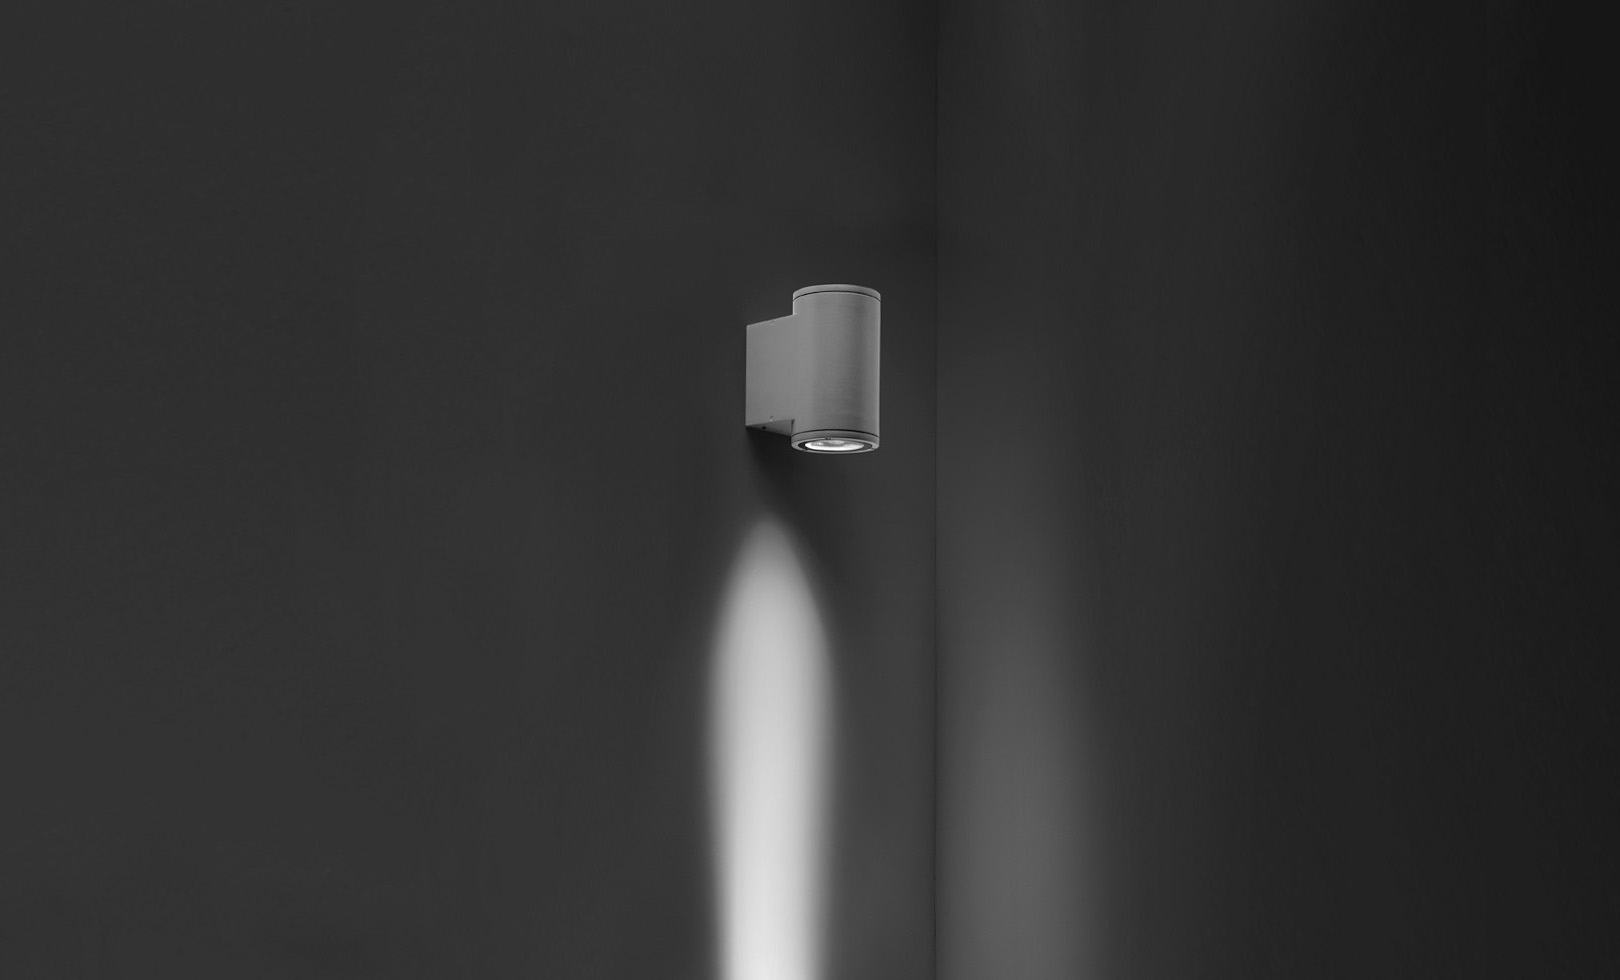 401012 TECH MEDIUM 01 ROUND LED 1x8W 1